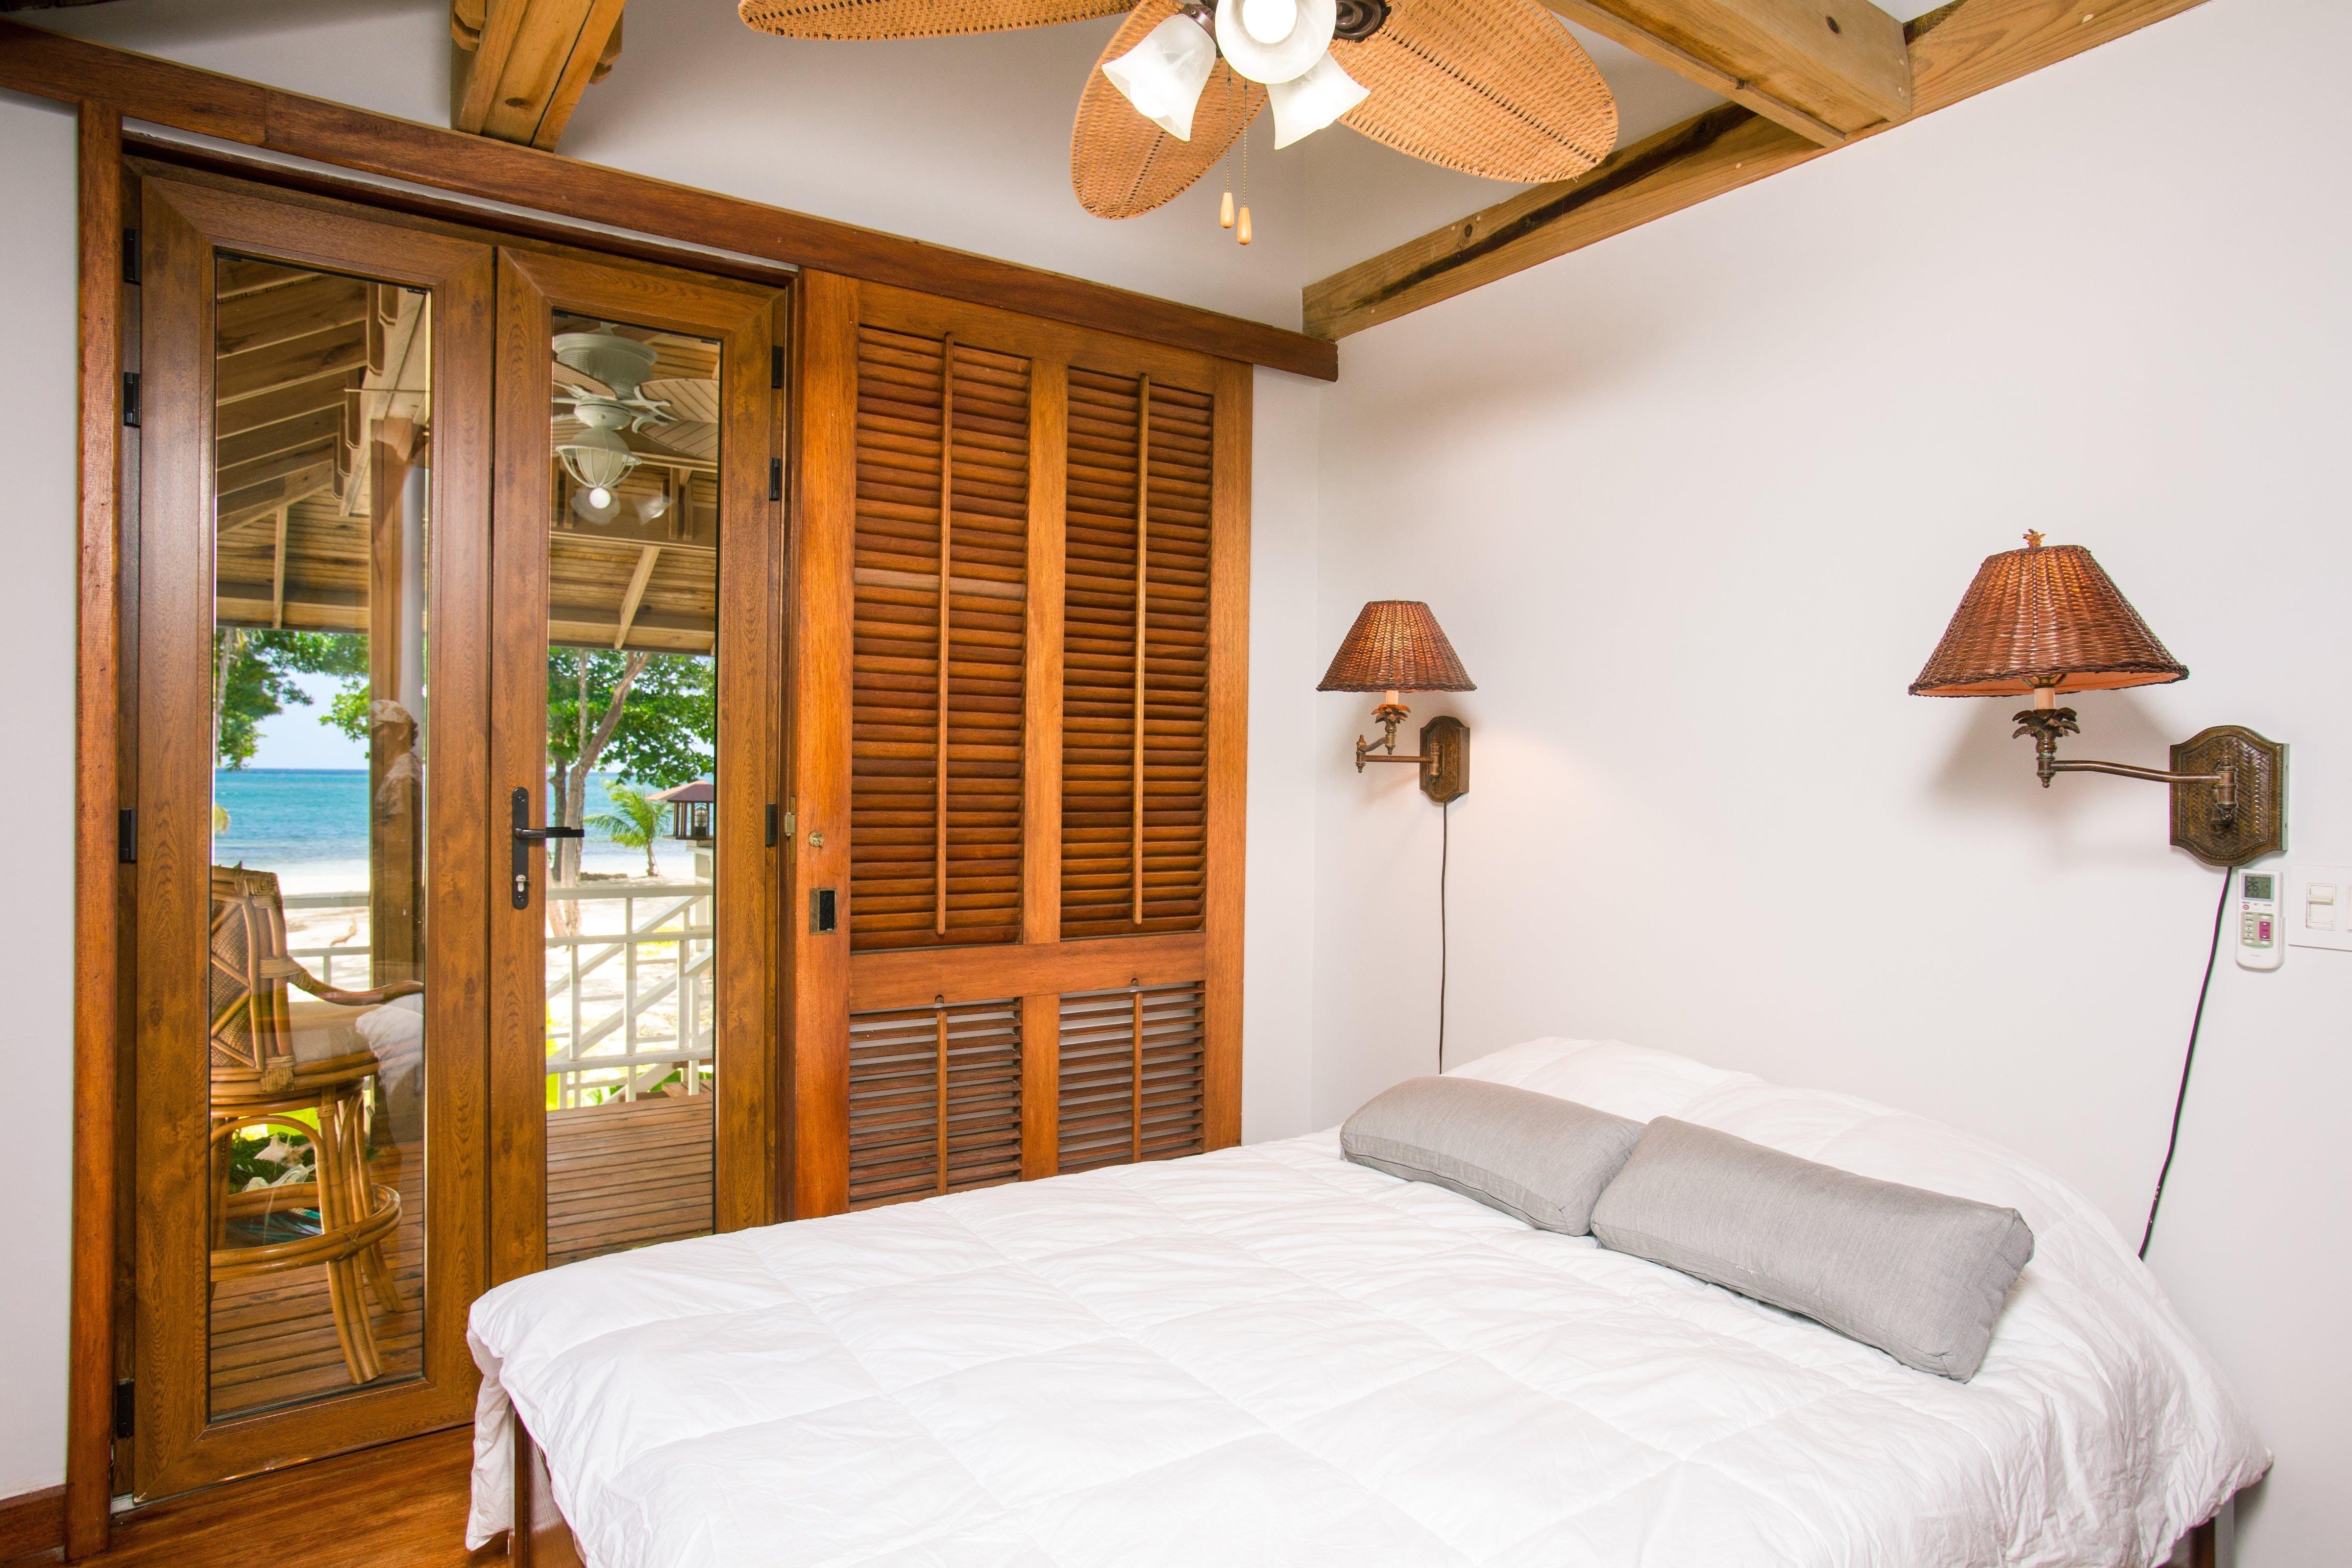 apartment, beach, bed